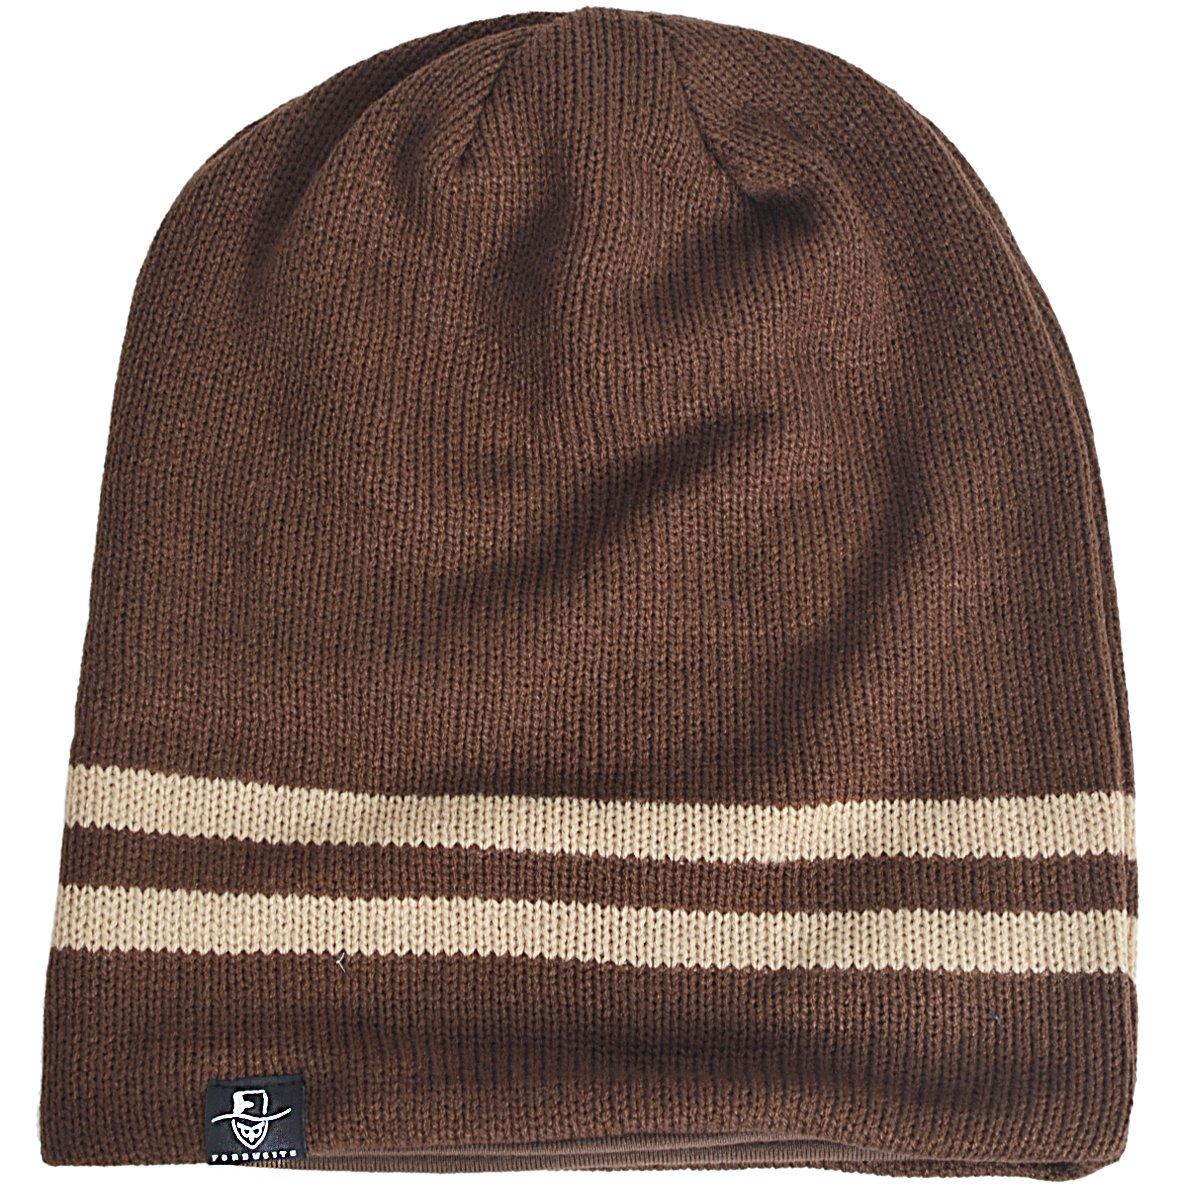 f31f869de490ff Vintage Men Baggy Beanie Slouchy Knit Skull Cap Hat (B318-Brown ...